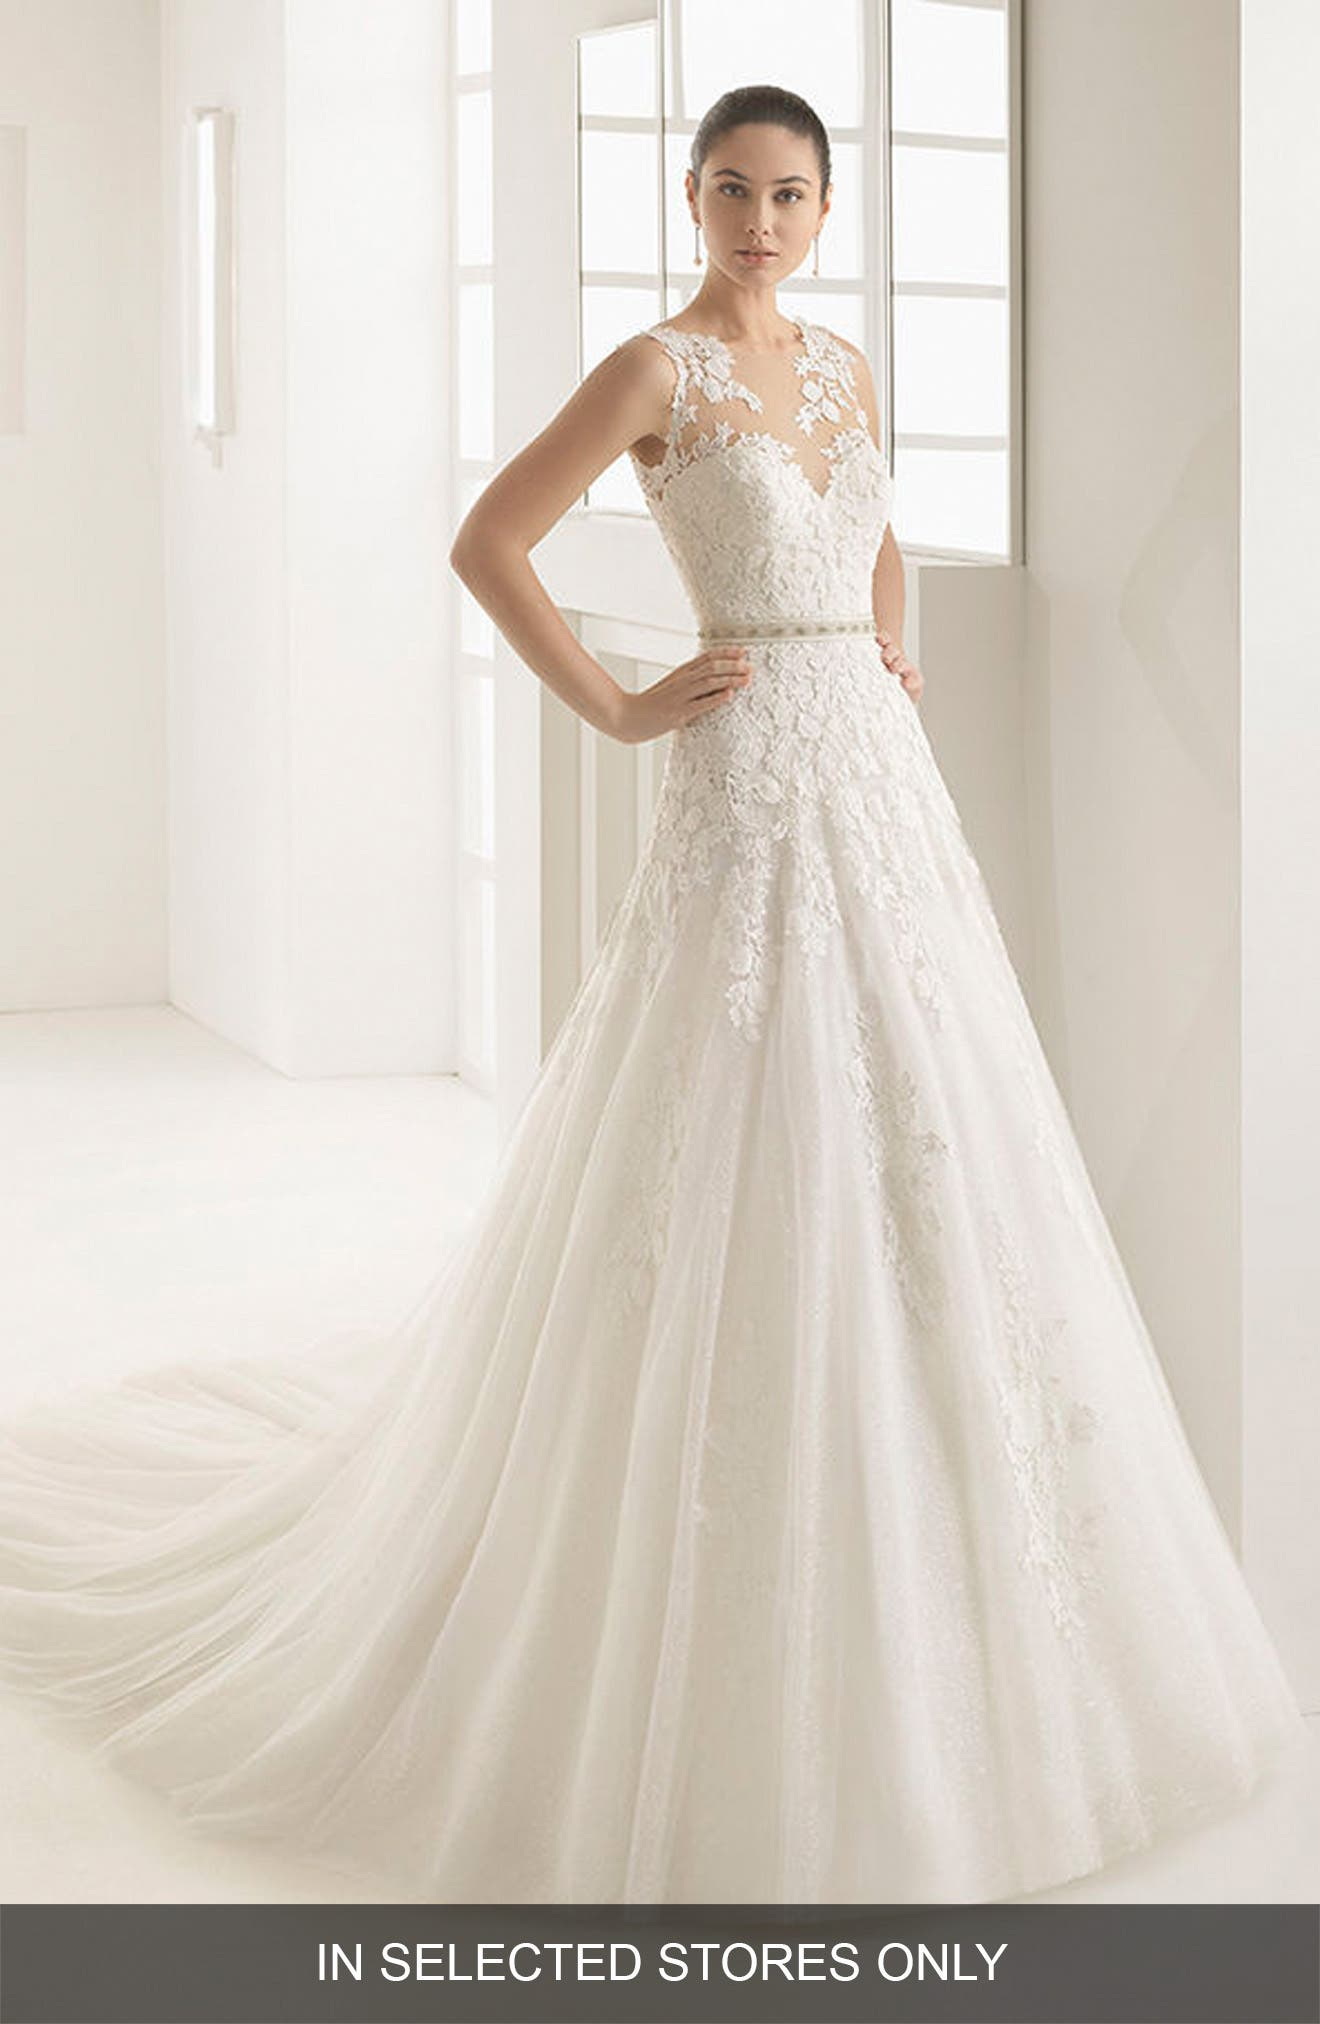 Main Image - Rosa Clara Oda Sleeveless Lace & Tulle Gown